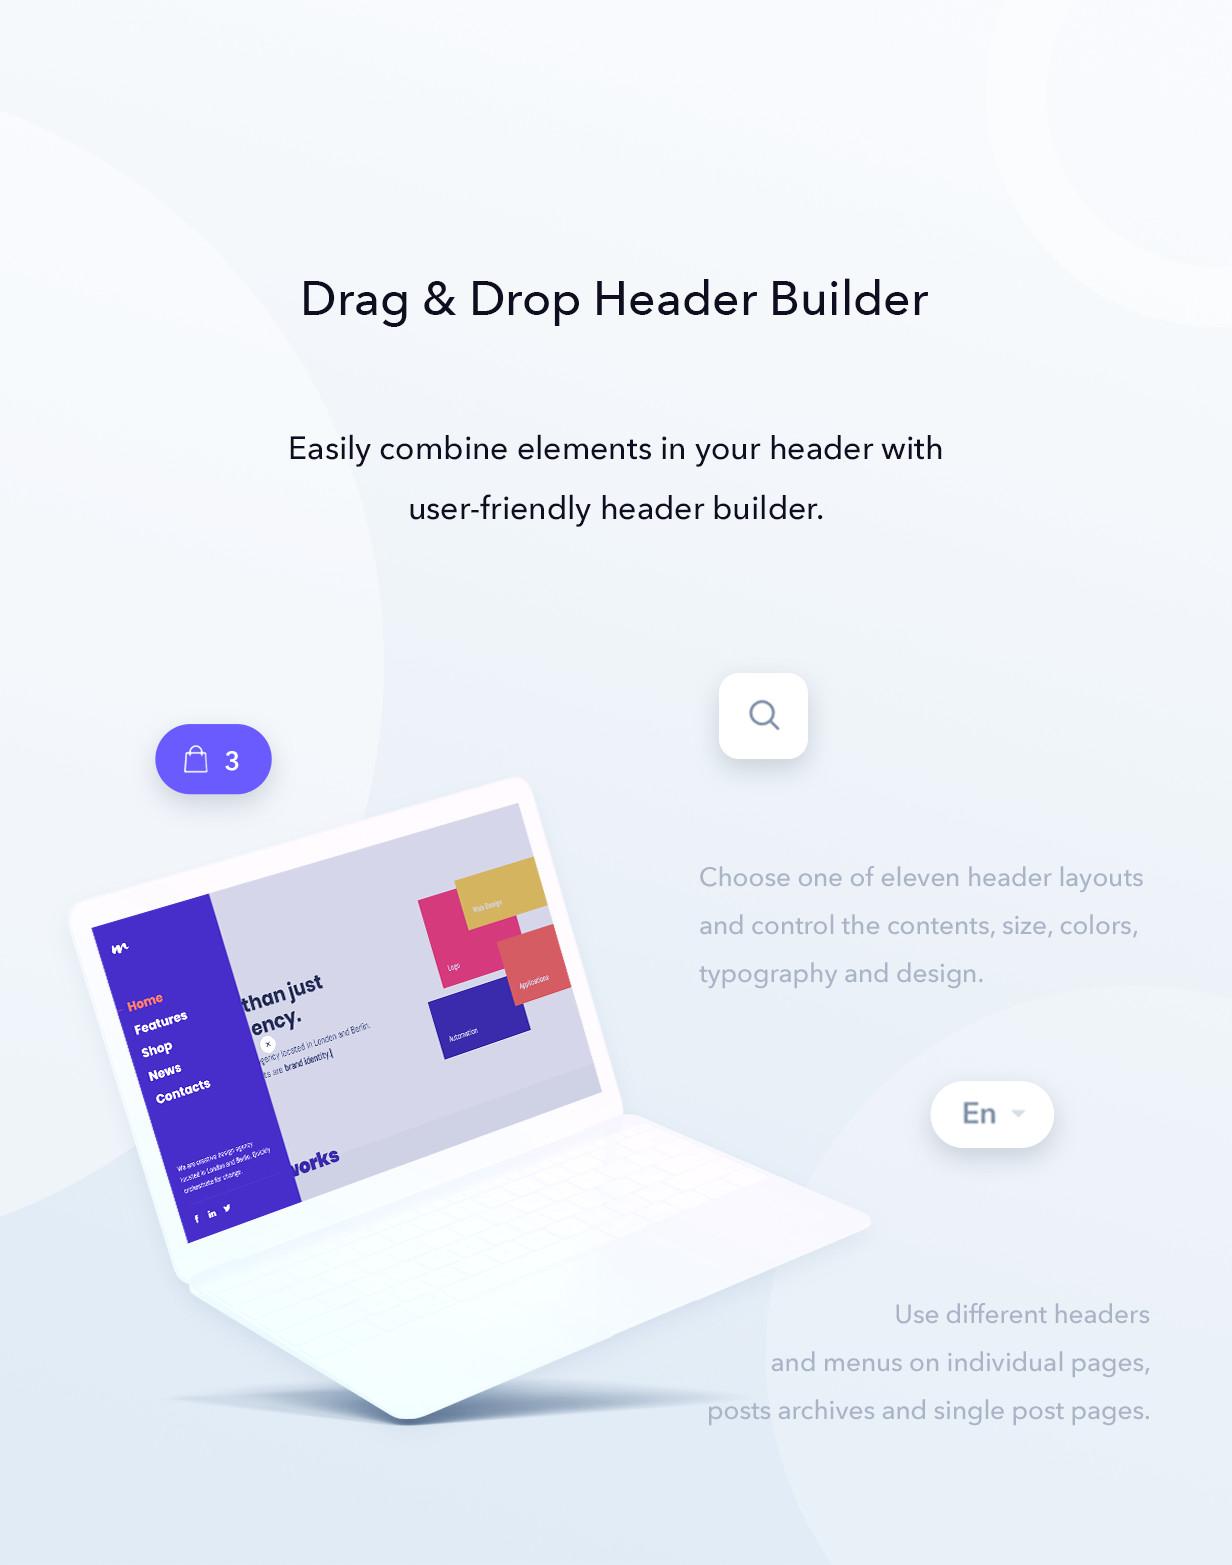 Drag and drop header builder